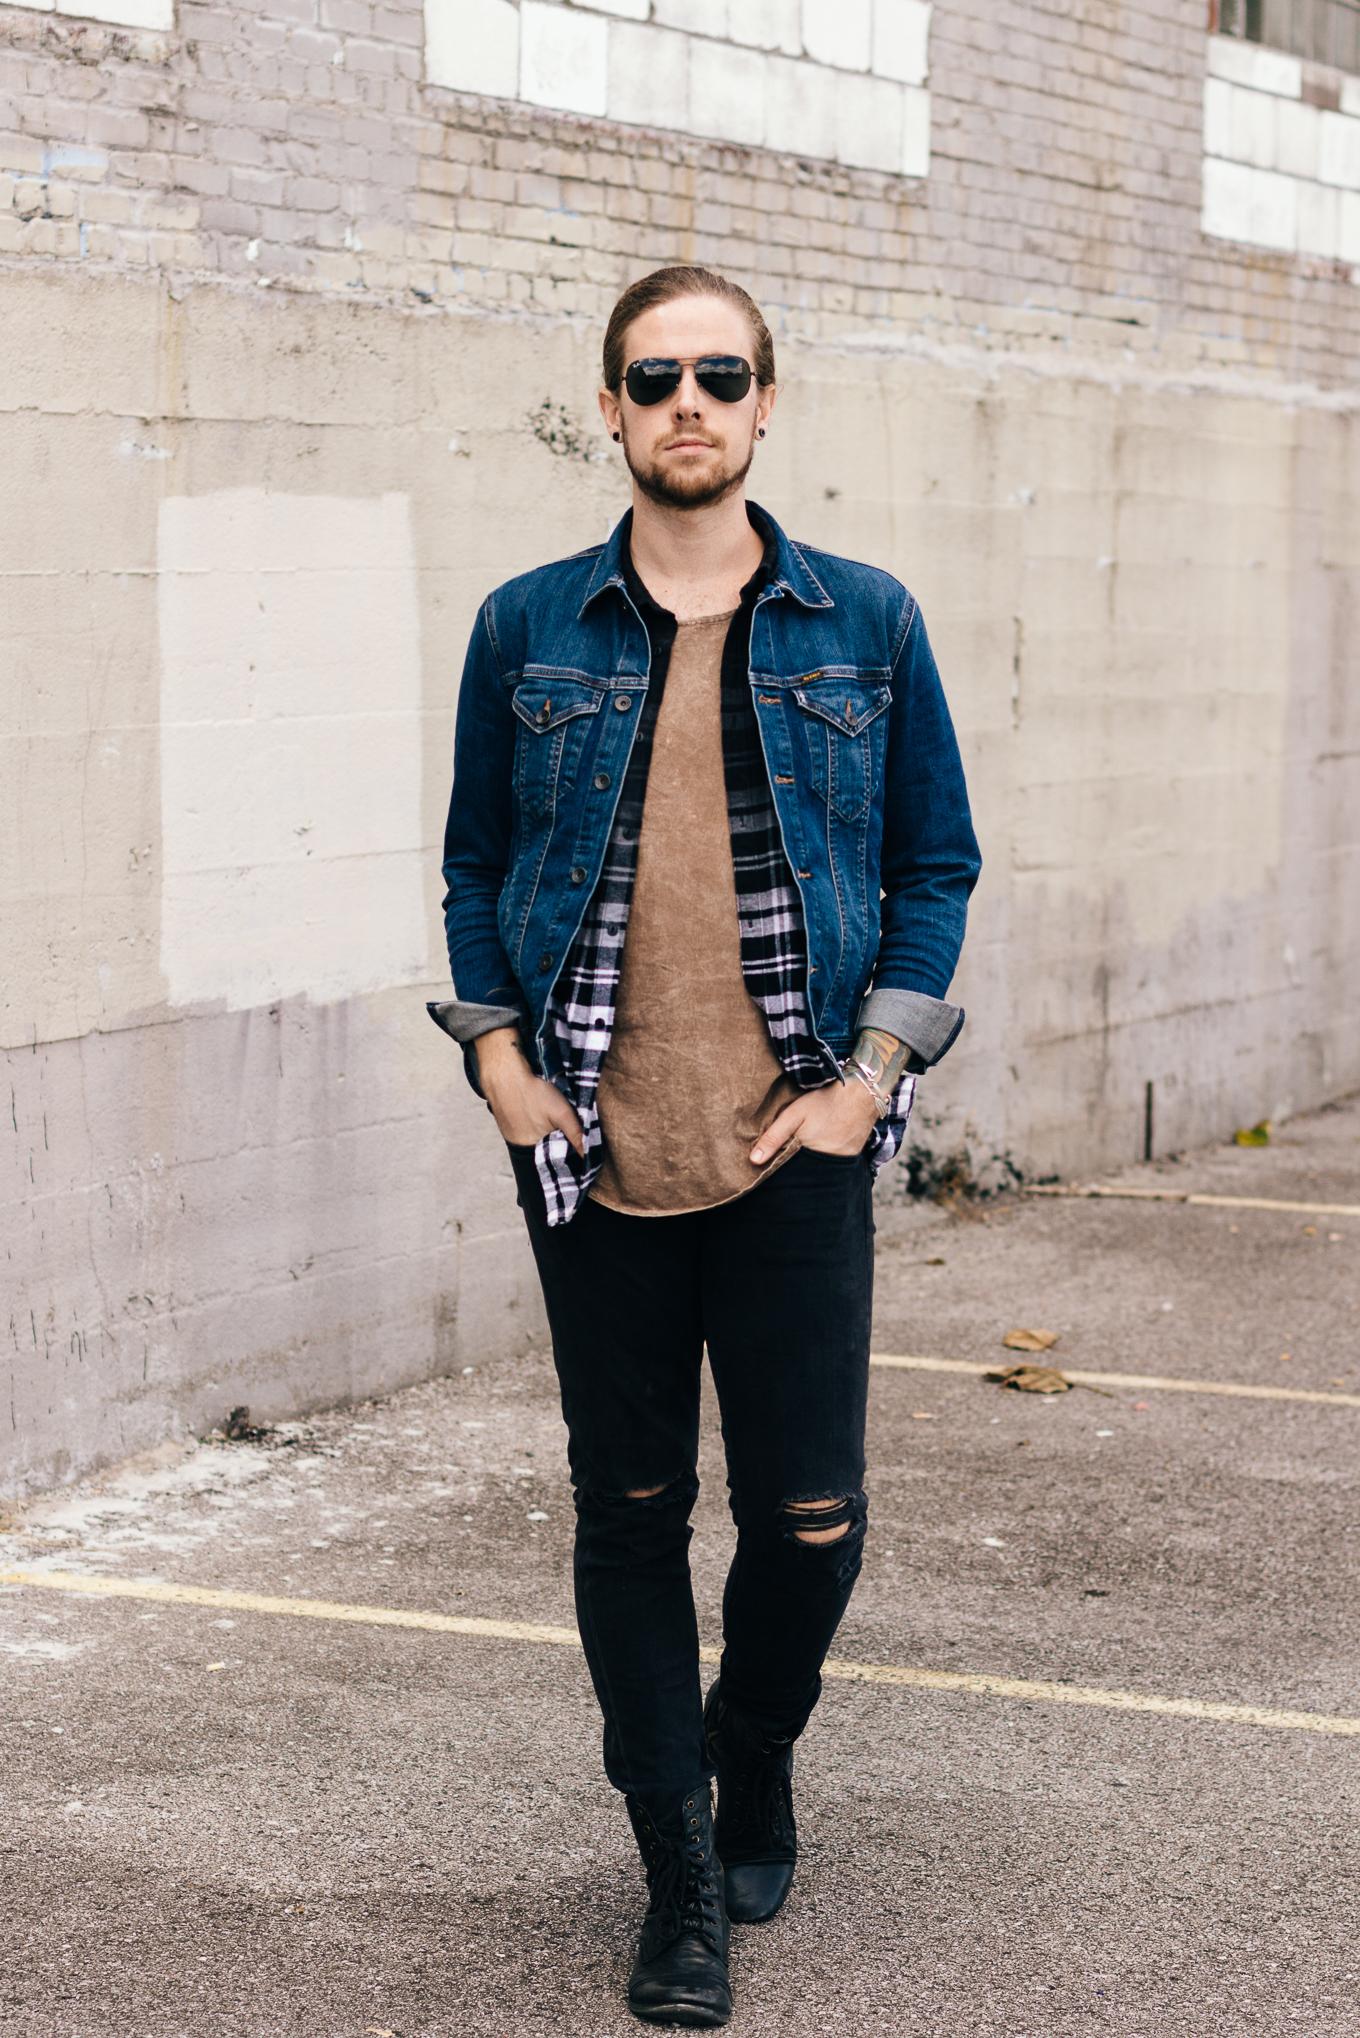 big star denim, rag & bone jeans, urban outfitters mens, mens plaid shirts, steve madden boots